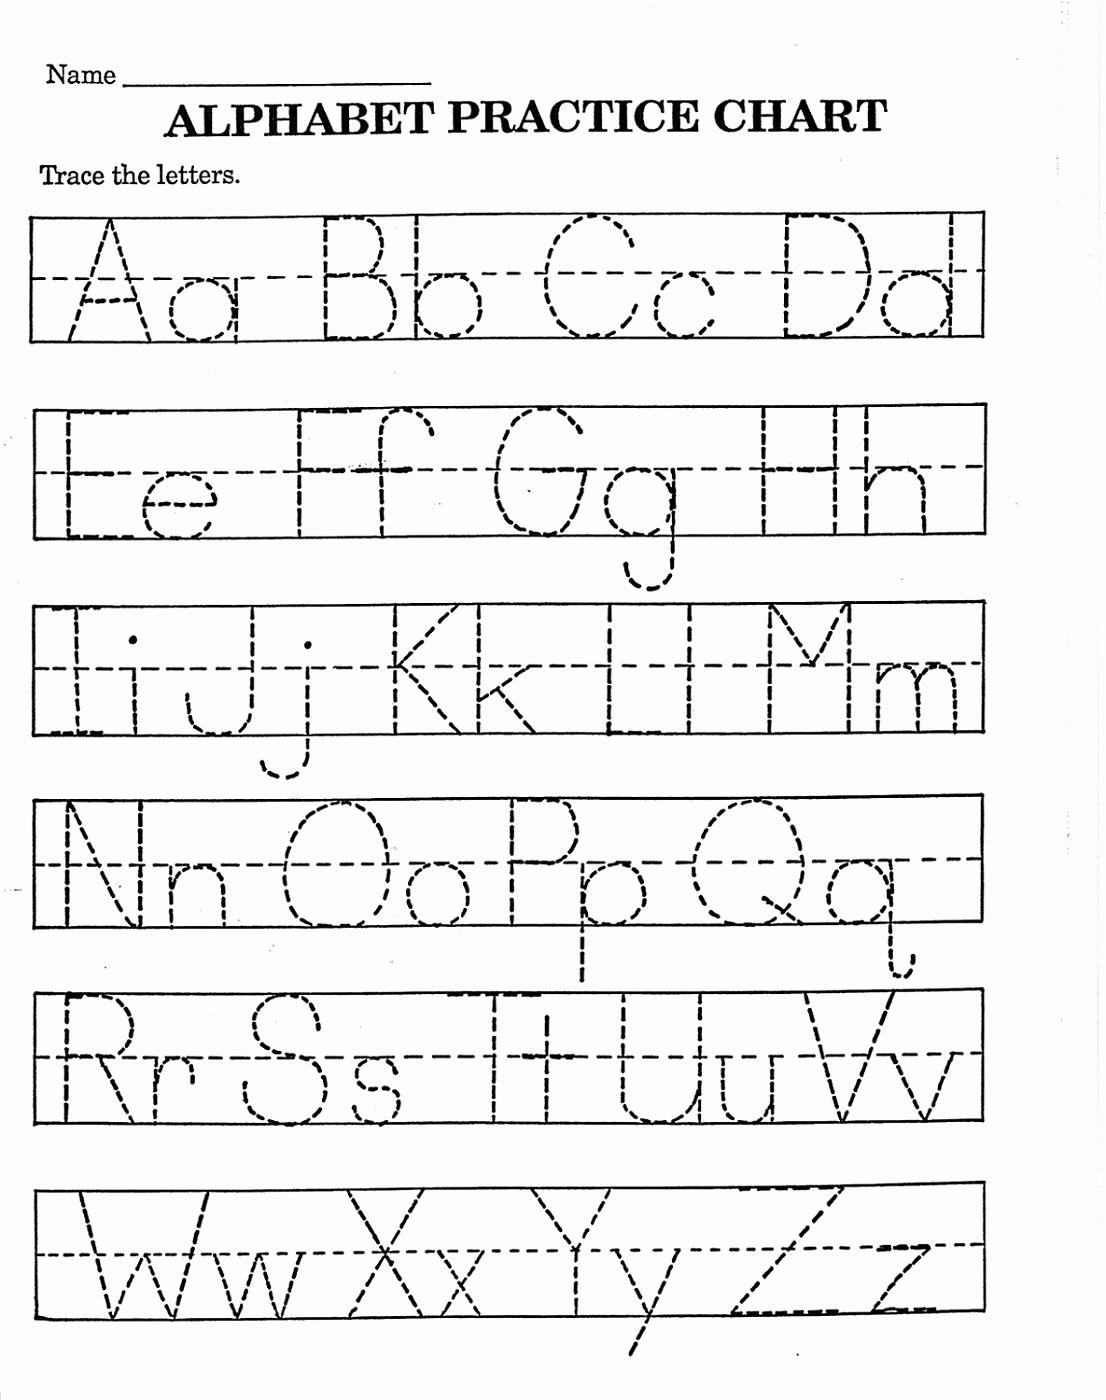 Alphabet Trace Worksheet Lovely Trace Letter Worksheets Free